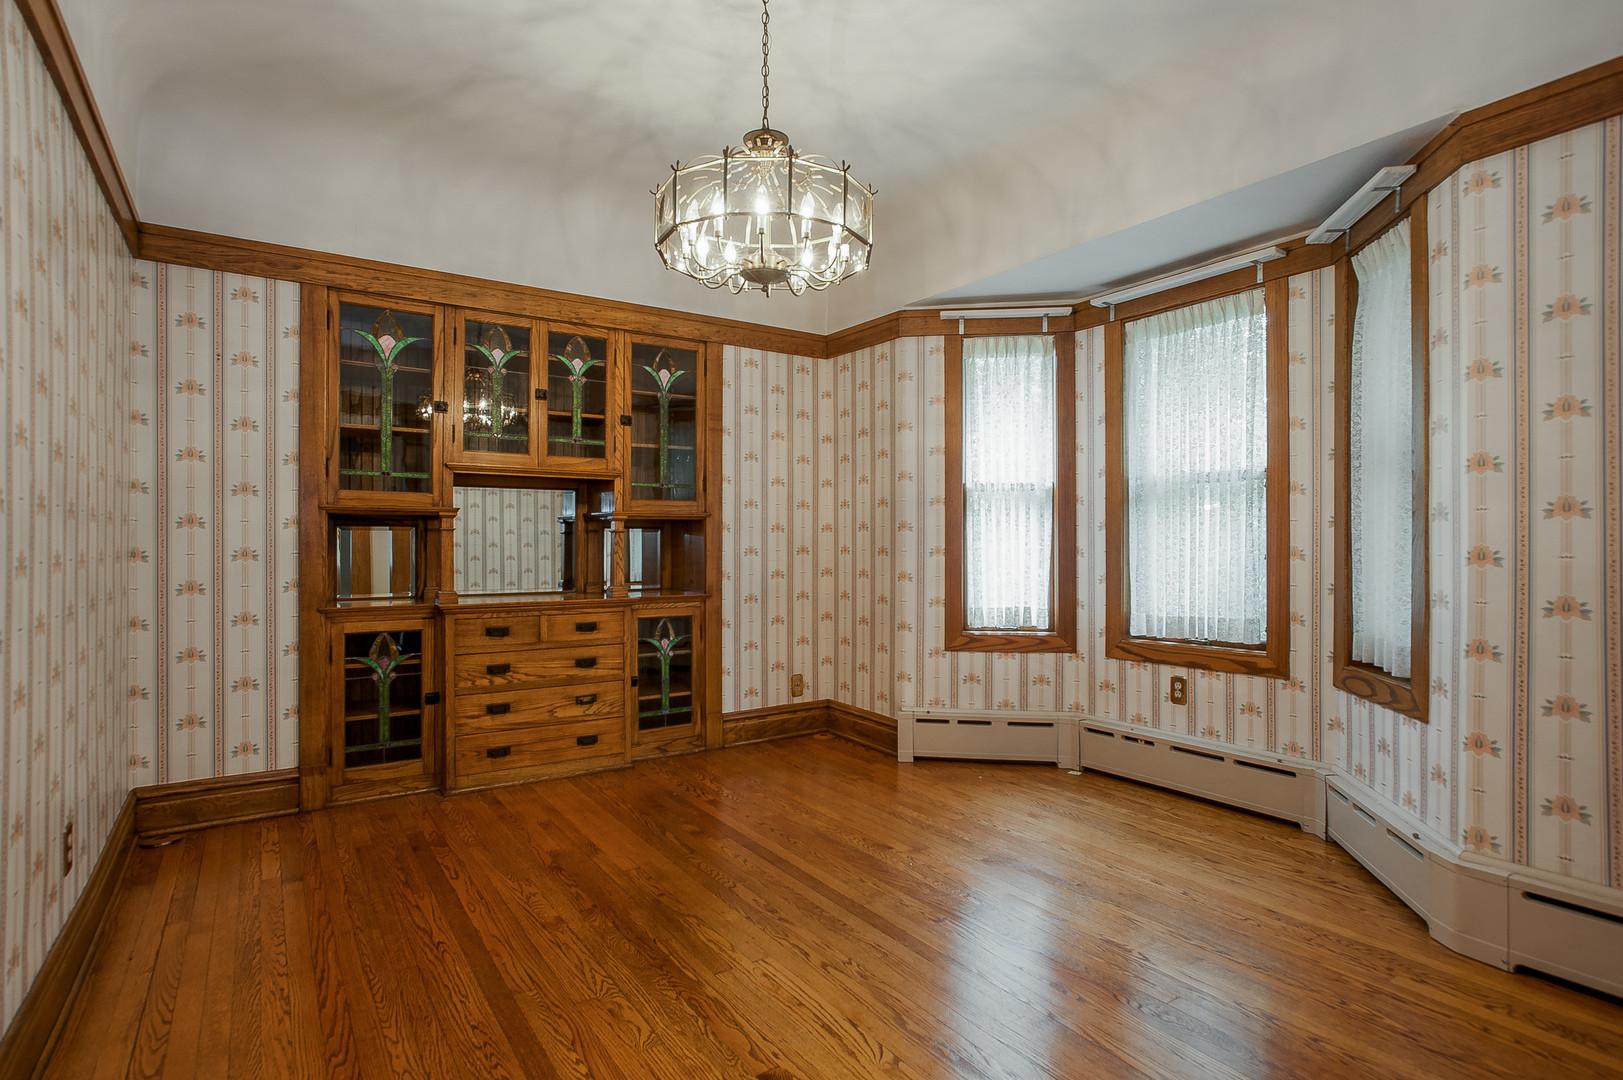 las hardwood flooring elmhurst of 552 s sunnyside ave elmhurst il 60126 realestate com within isqdb7o4mp5frl1000000000